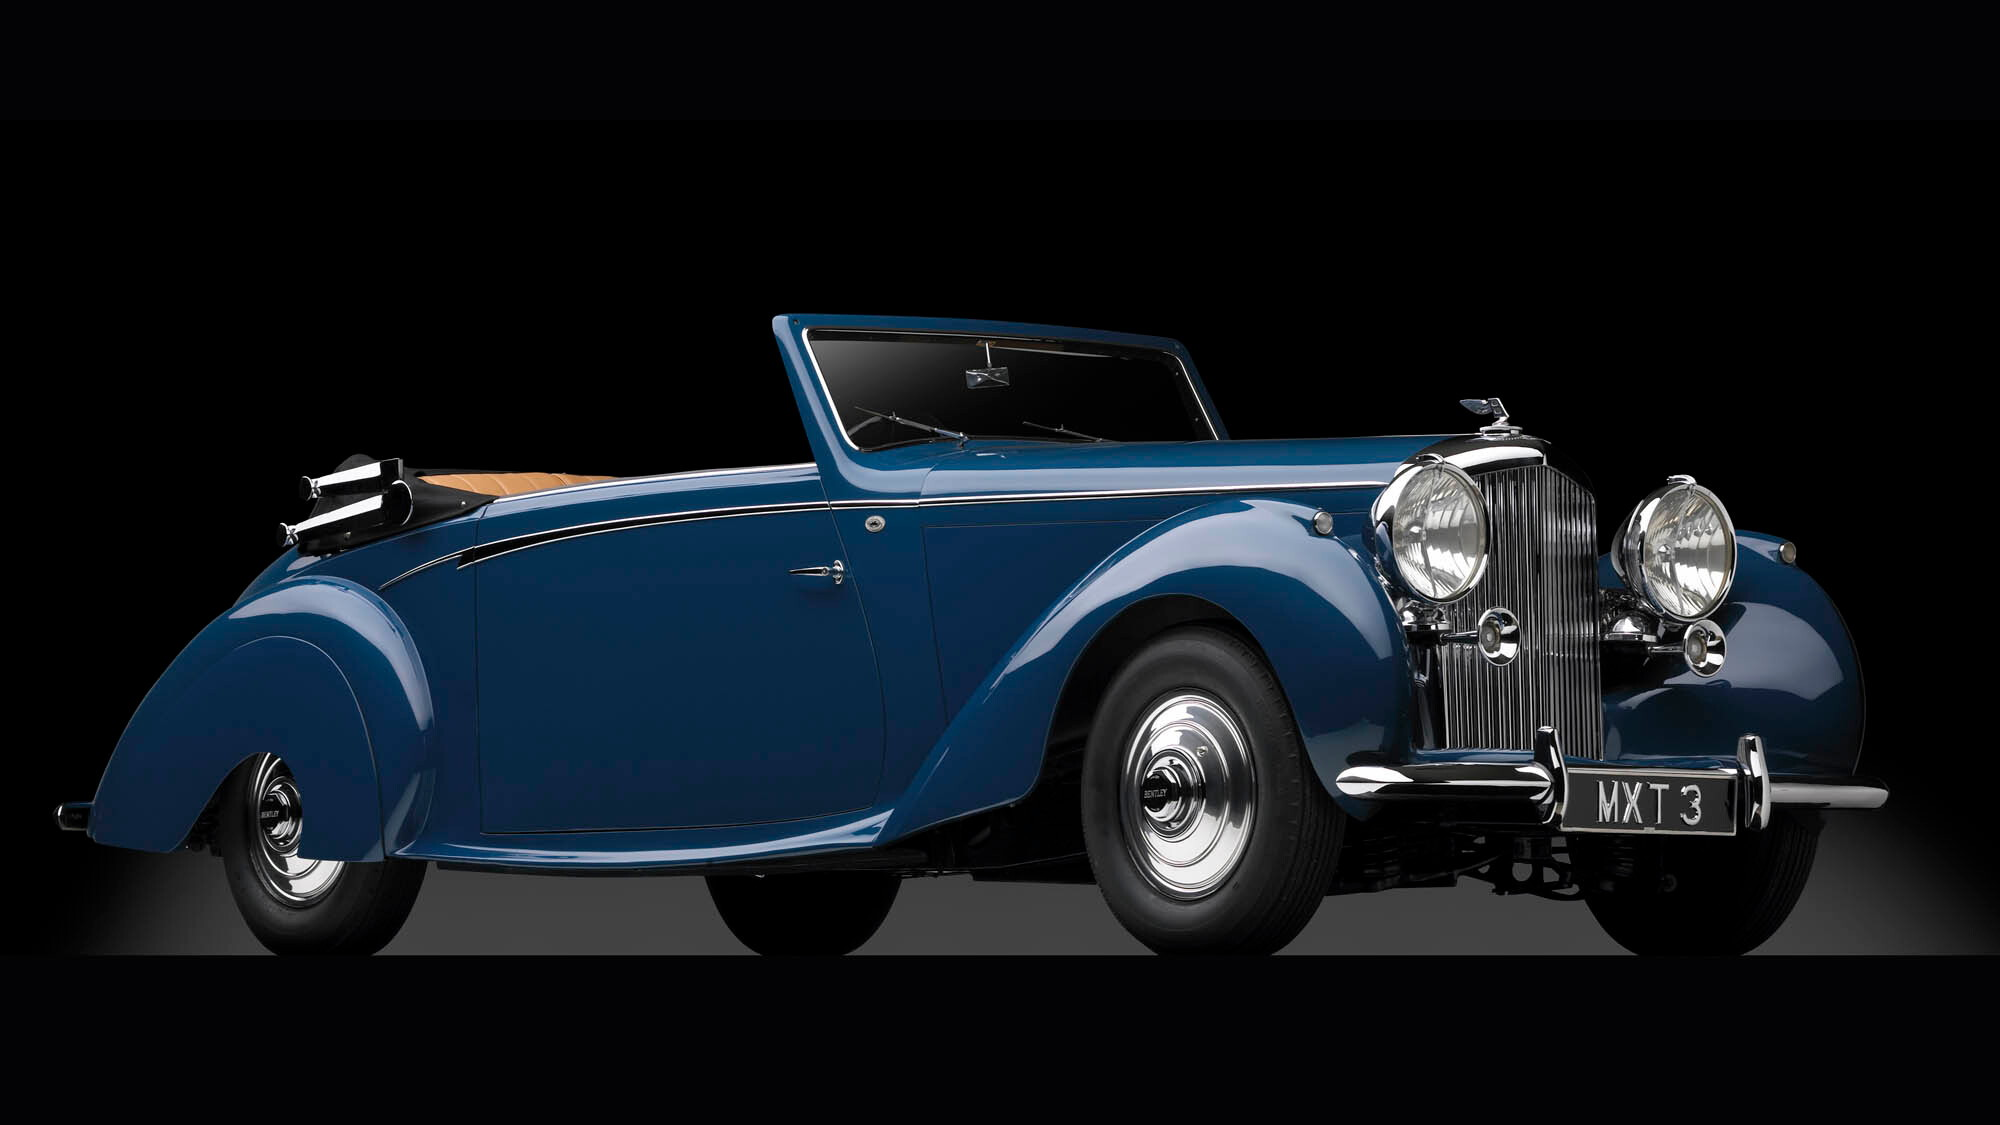 1939 Bentley Mark V Three-Position DHC Coachwork by Saoutchik